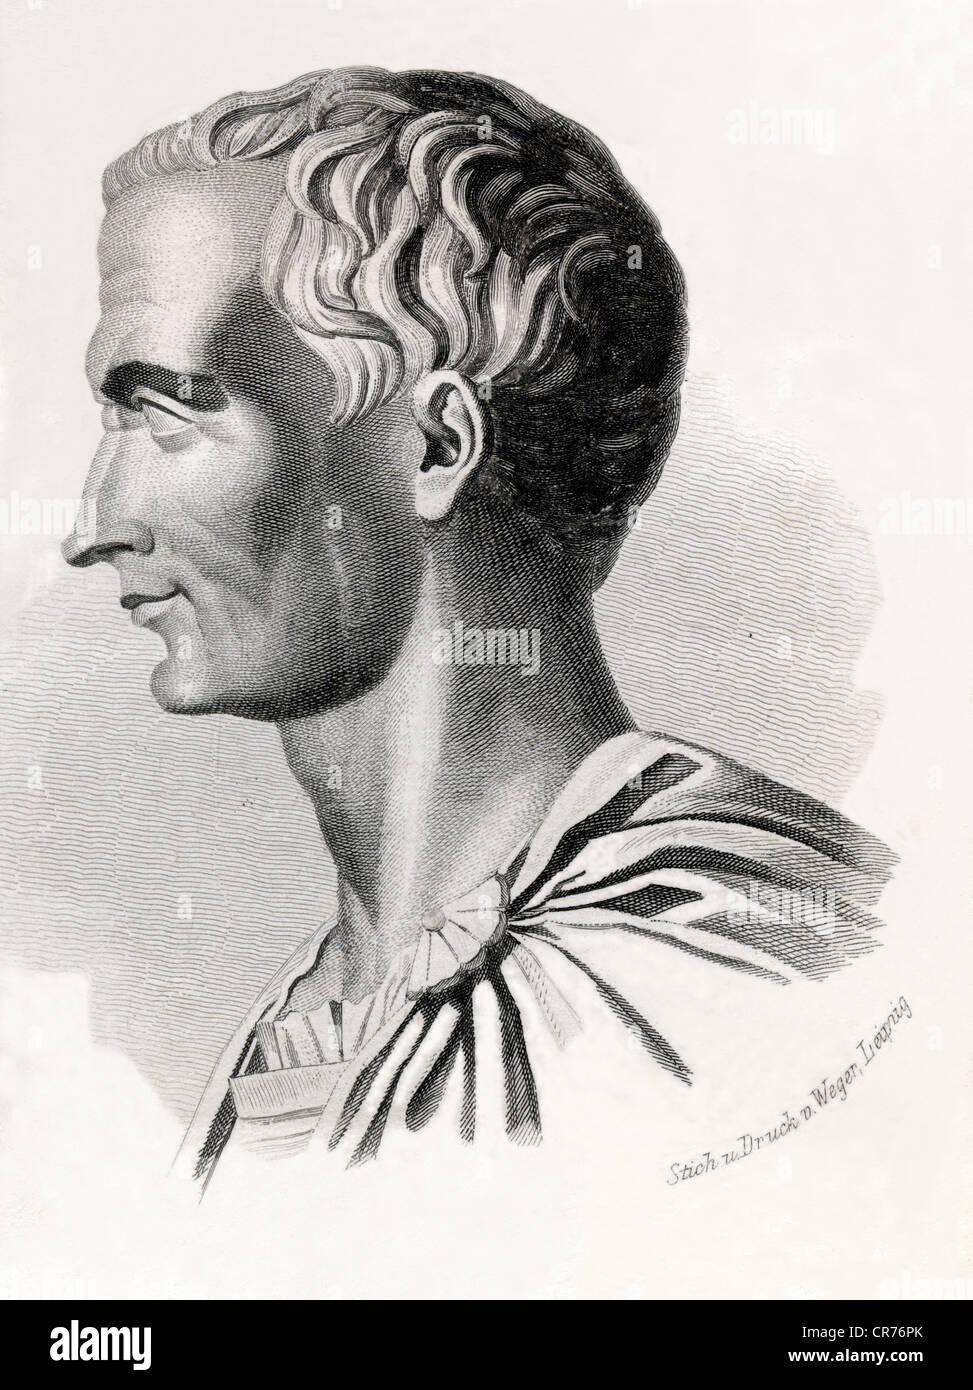 Gaius Julius Caesar, born 13. 07. 100 BC, assassinated  15. 03. 44 pre-Christian in Rome, roman statesman, strategist - Stock Image